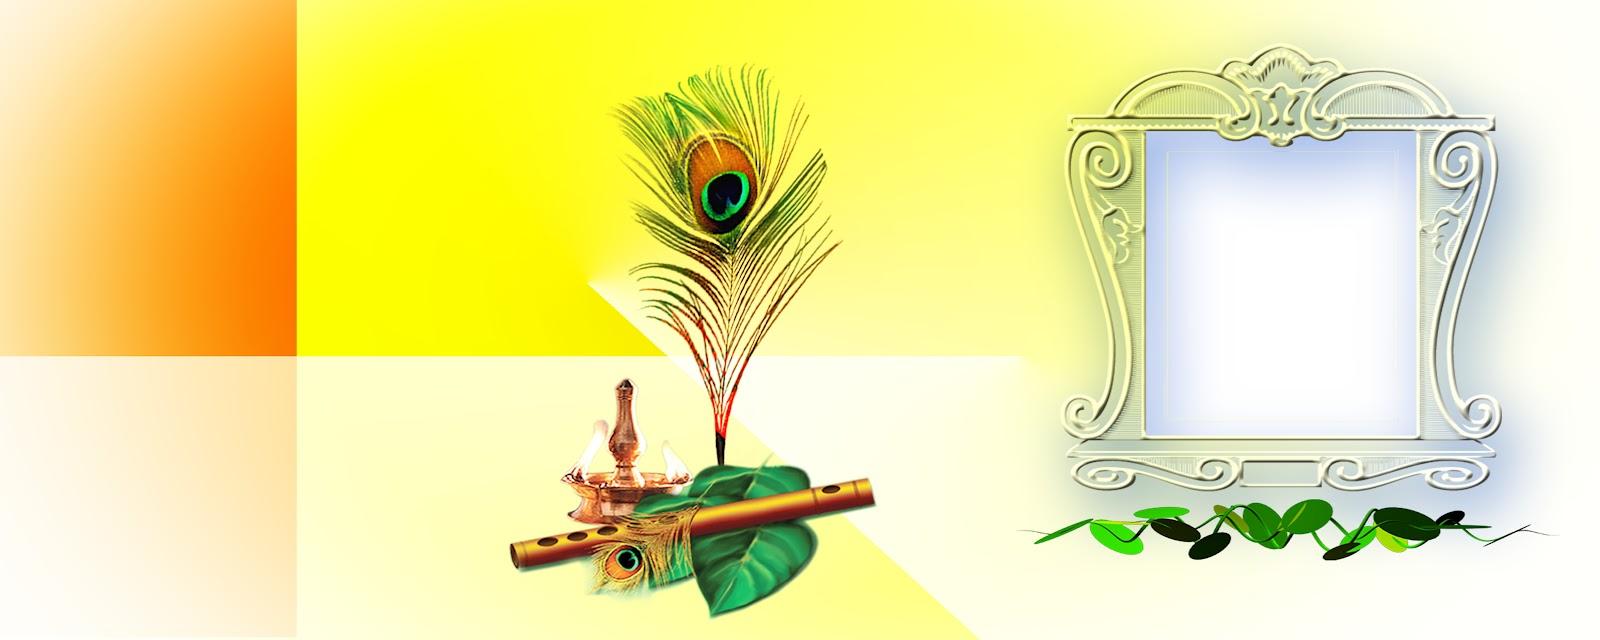 Marriage Album Cover Design 12x18 PSD Templates ... |Wedding Album Cover Design Hd